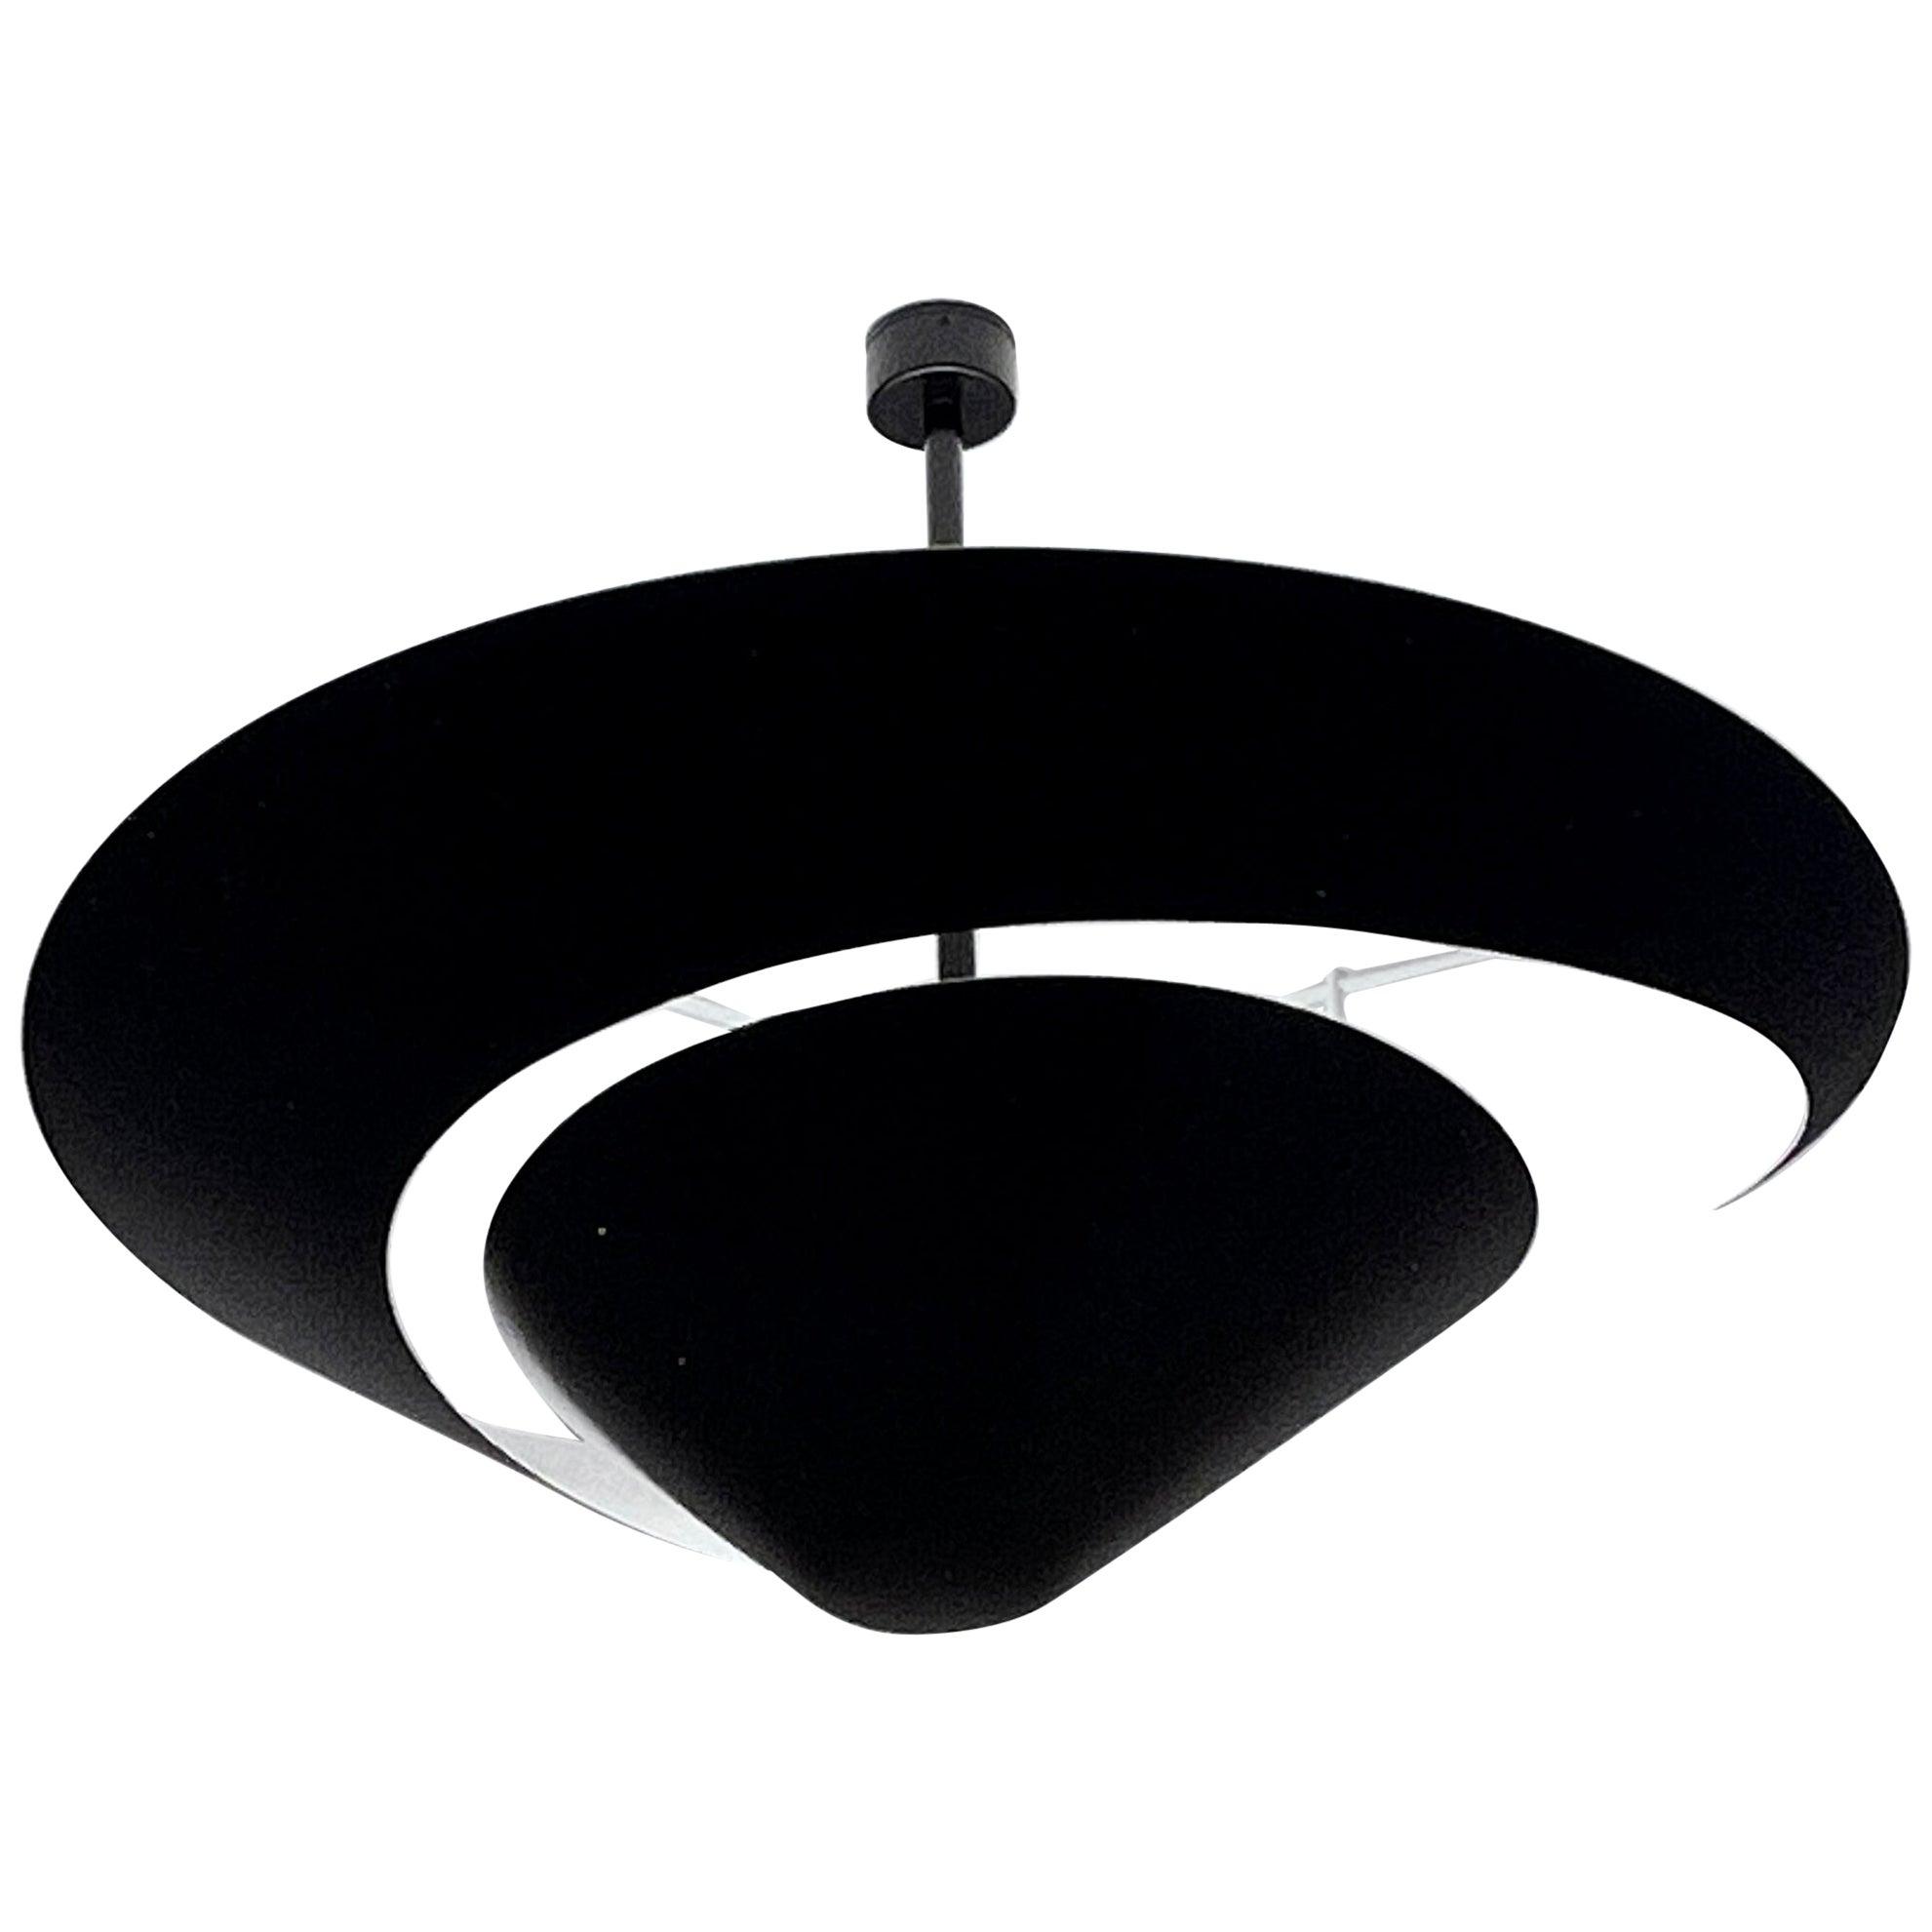 Large Serge Mouille 'Snail' Ceiling Lamp